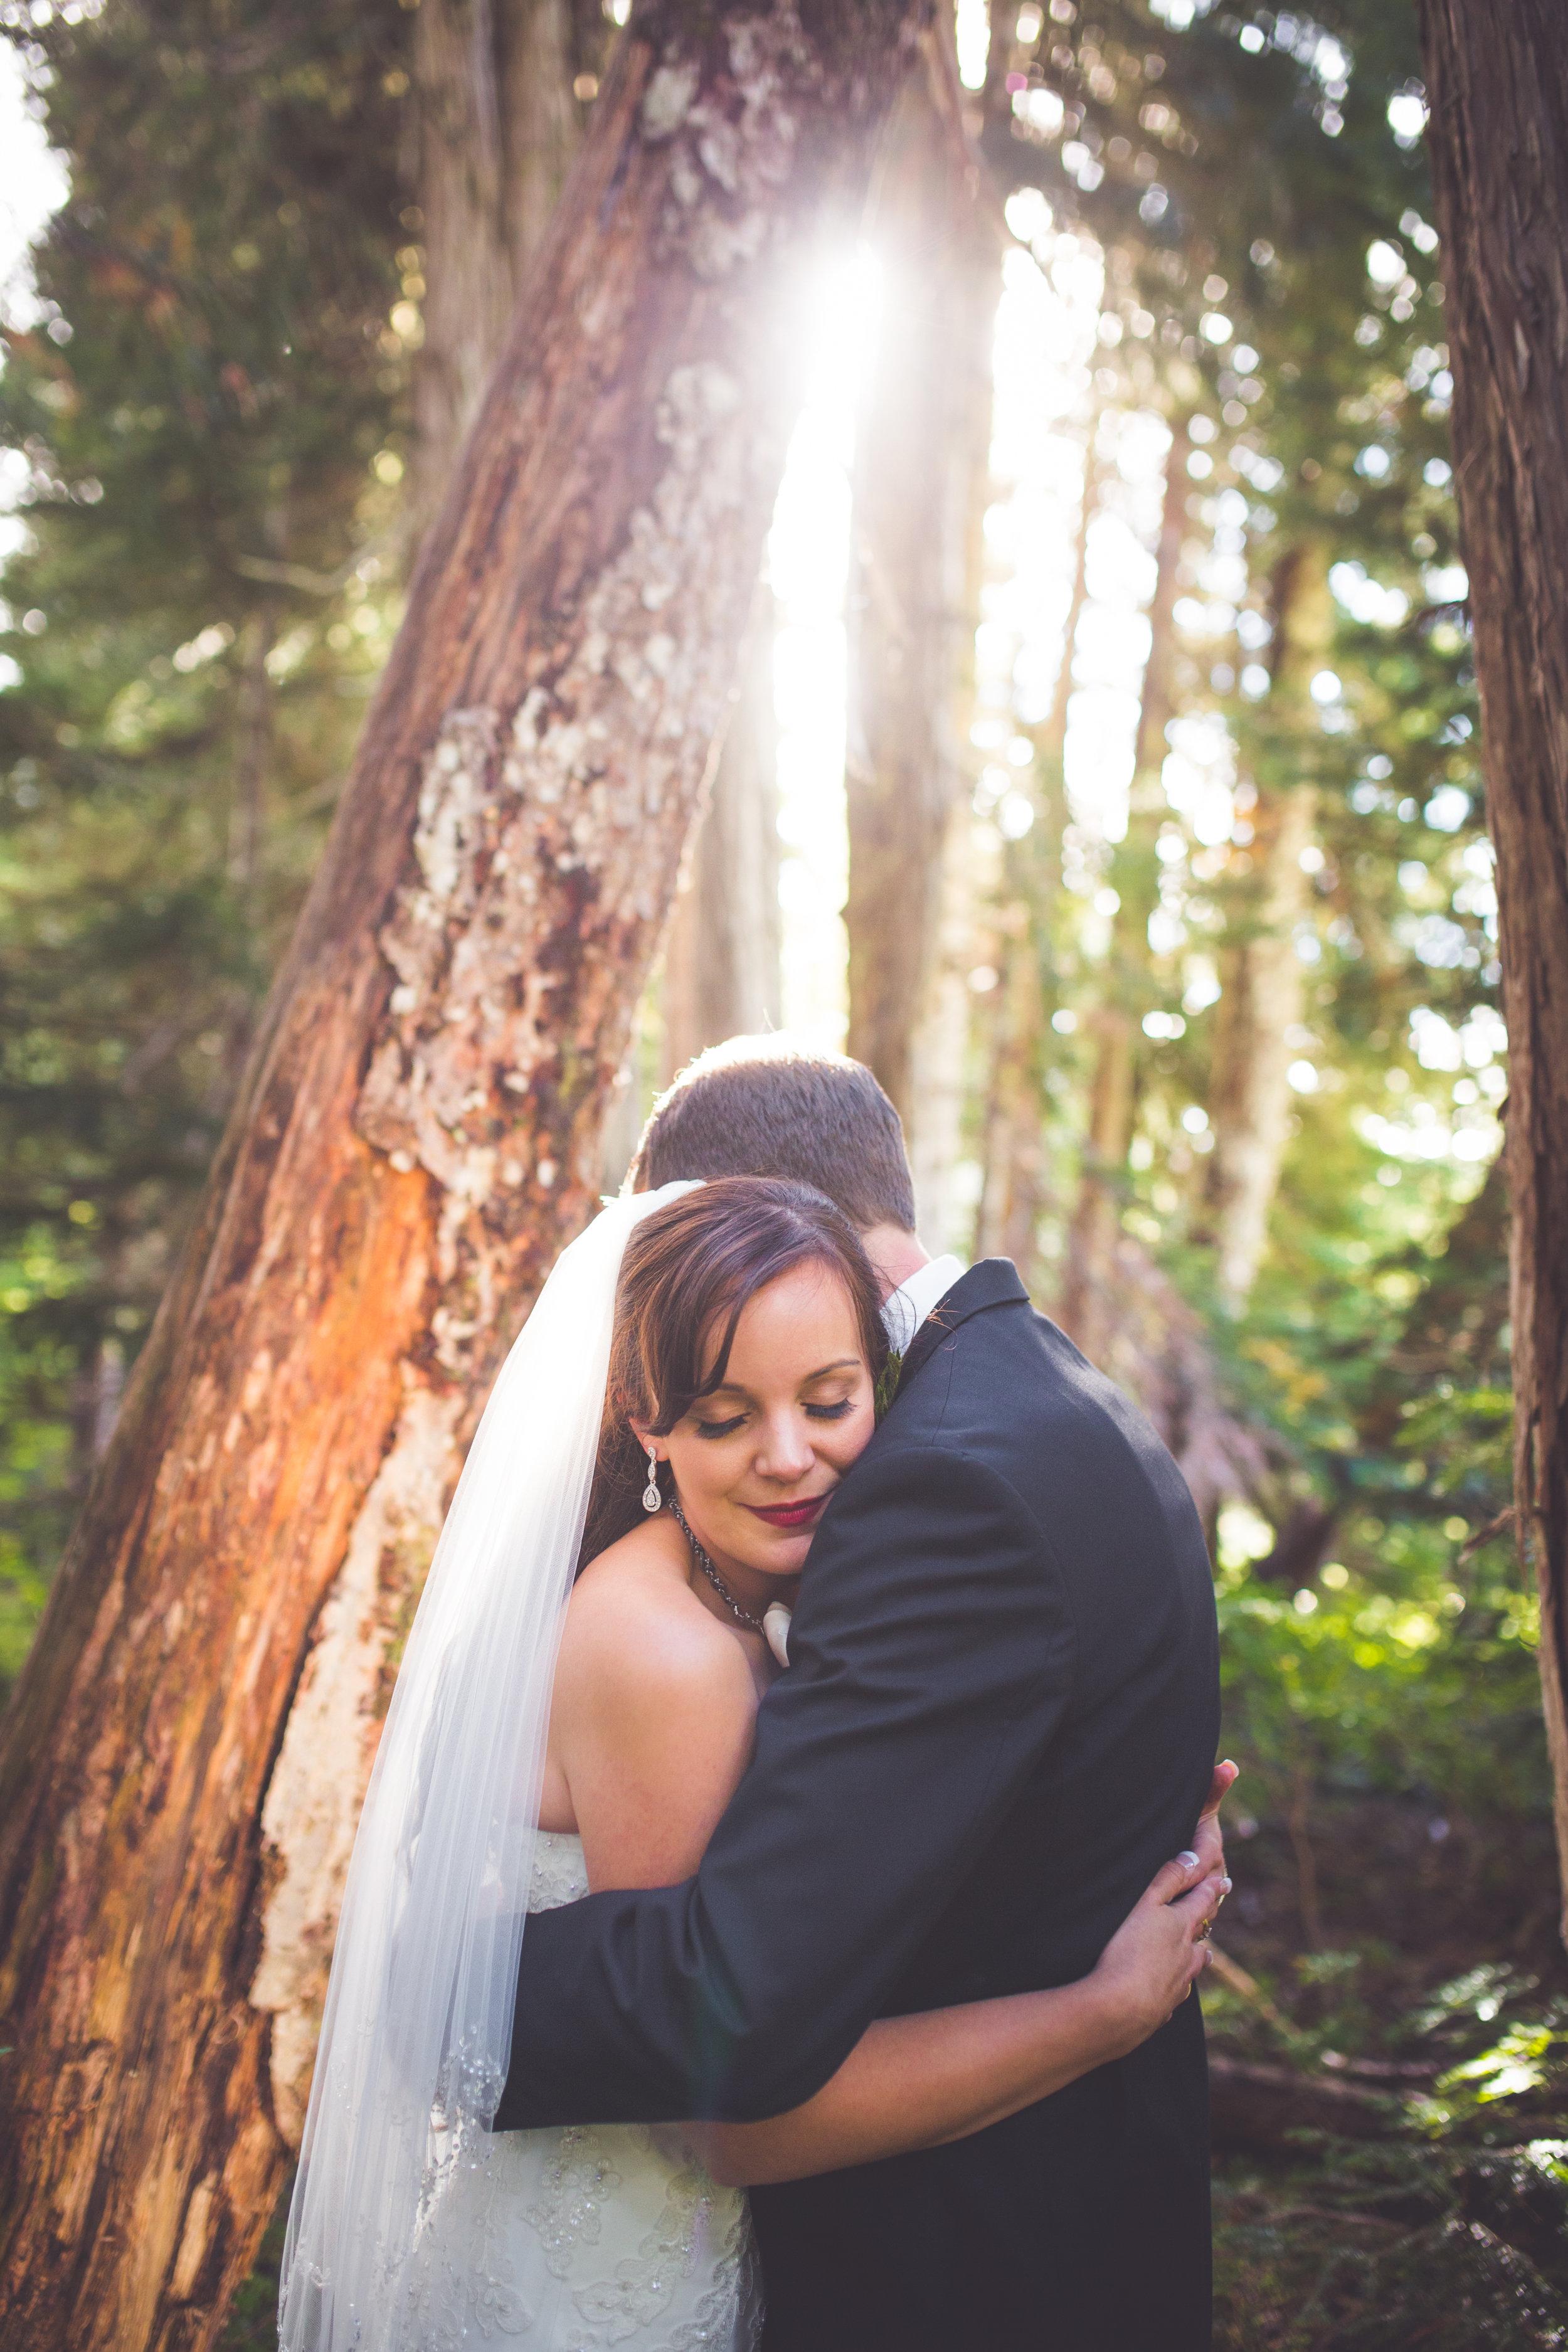 golden hour photos of bride and groom at mount washington resort